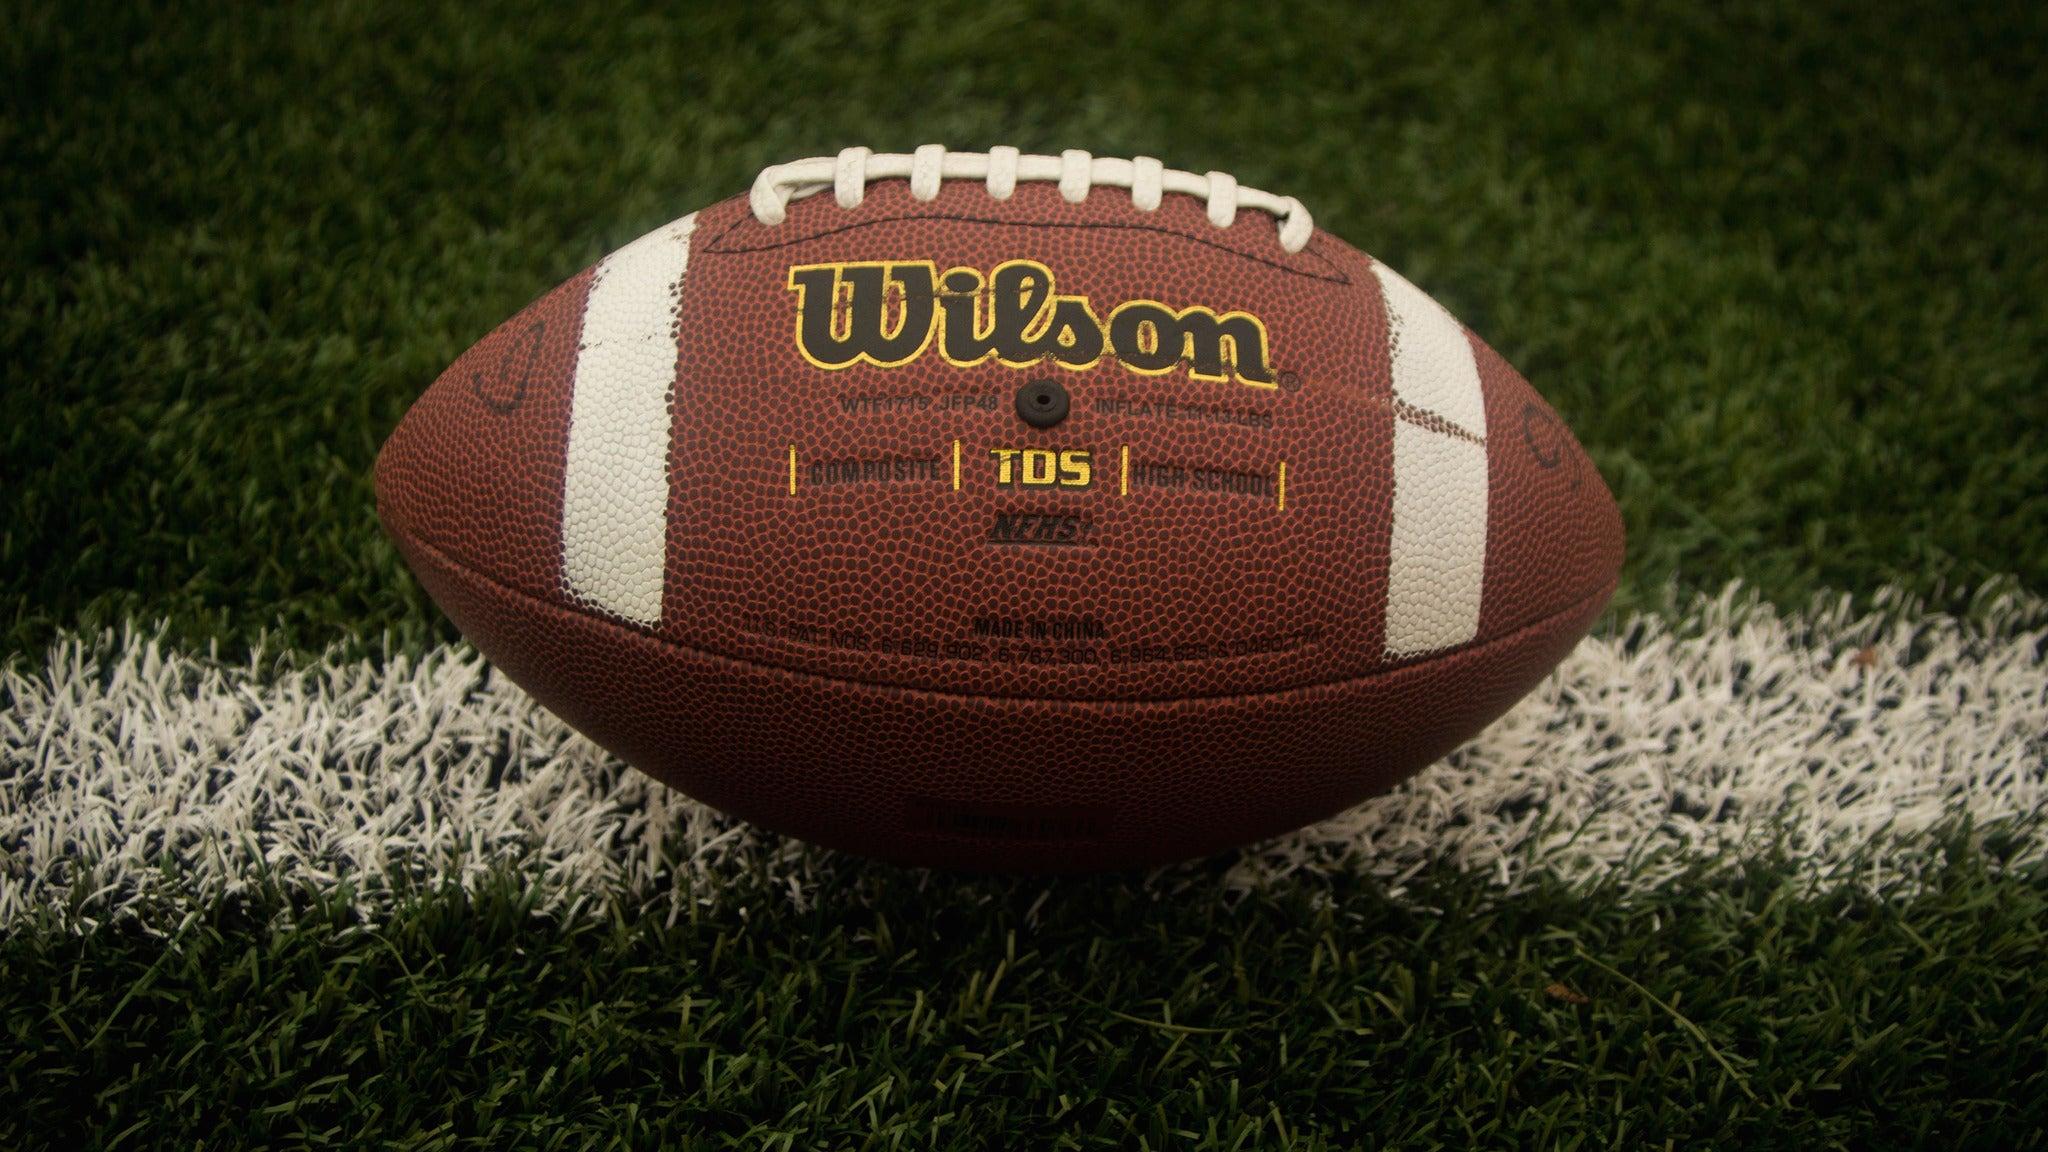 Texas Longhorns Football vs. Oklahoma State Cowboys Football